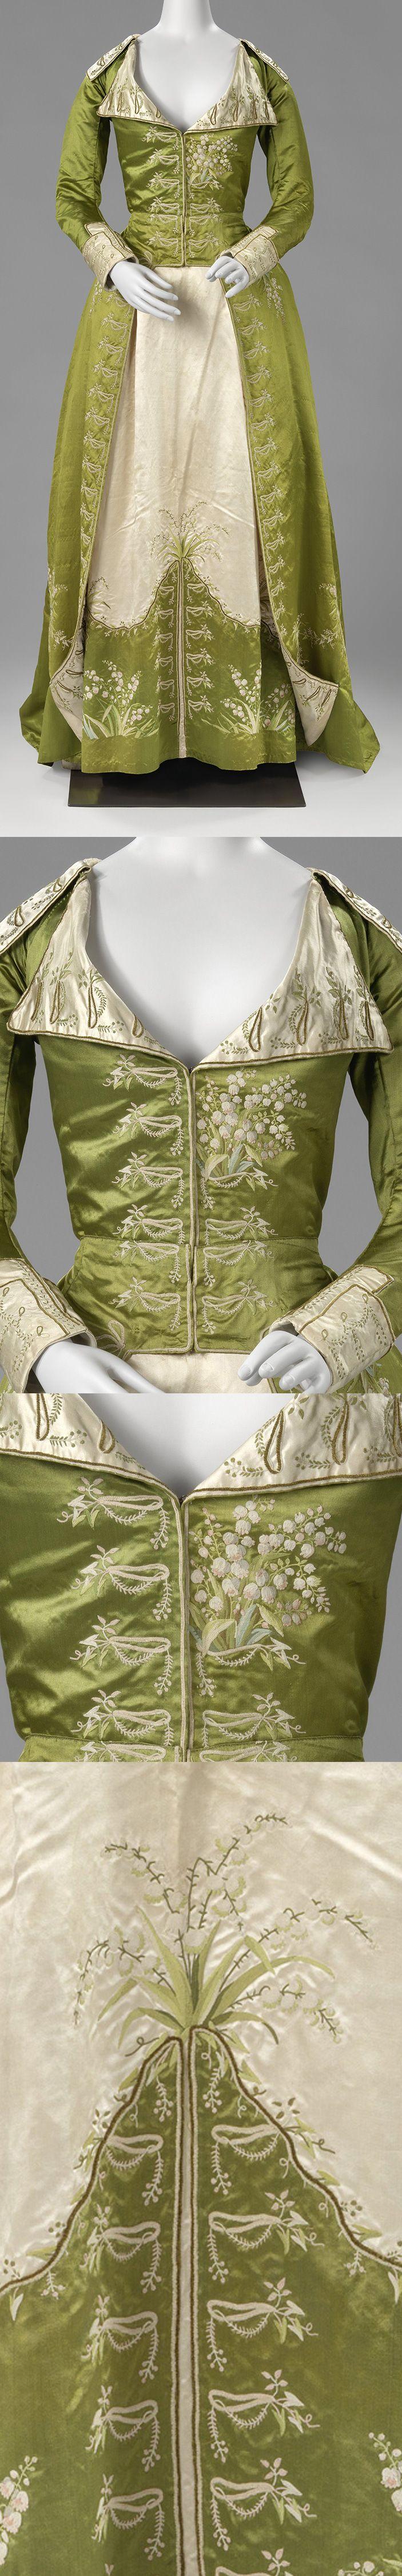 Redingote or Great-Coat Dress, c.1786 - c.1789, satin, silk, Netherlands, BK-1978-250 | Rijksmuseum